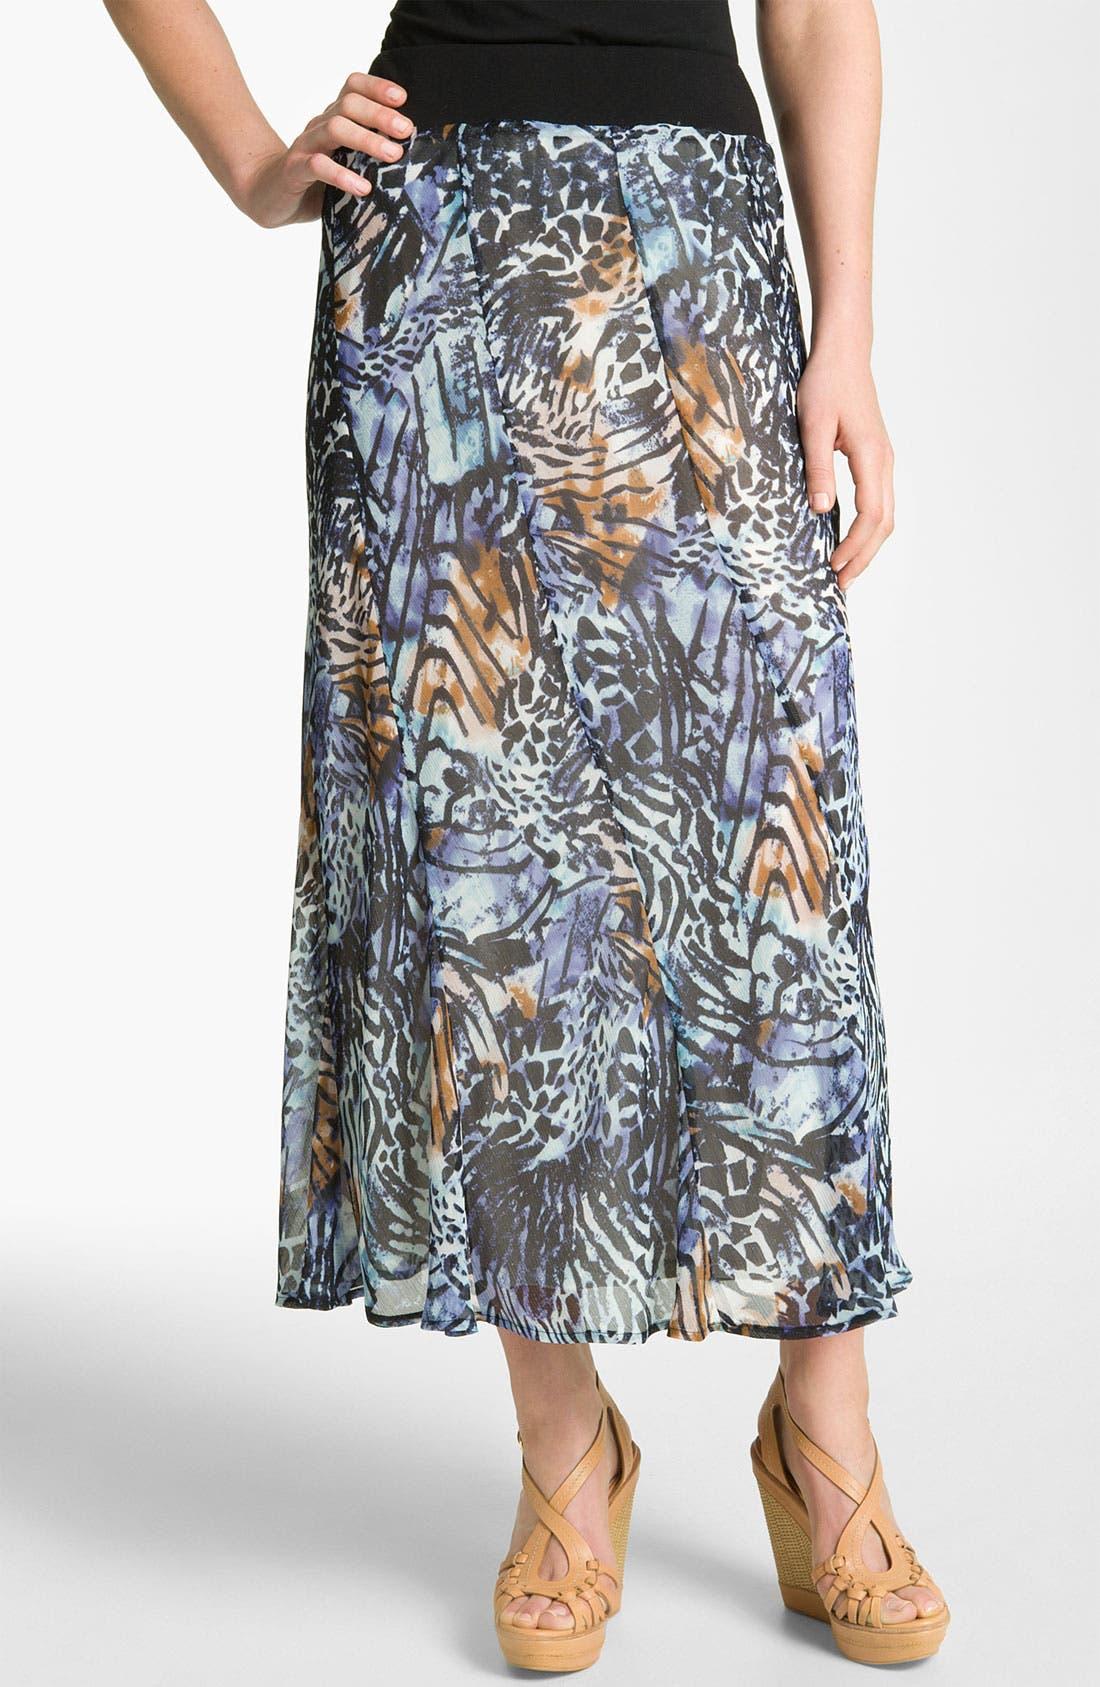 Alternate Image 1 Selected - Nic + Zoe 'Pattern Play' Print Maxi Skirt